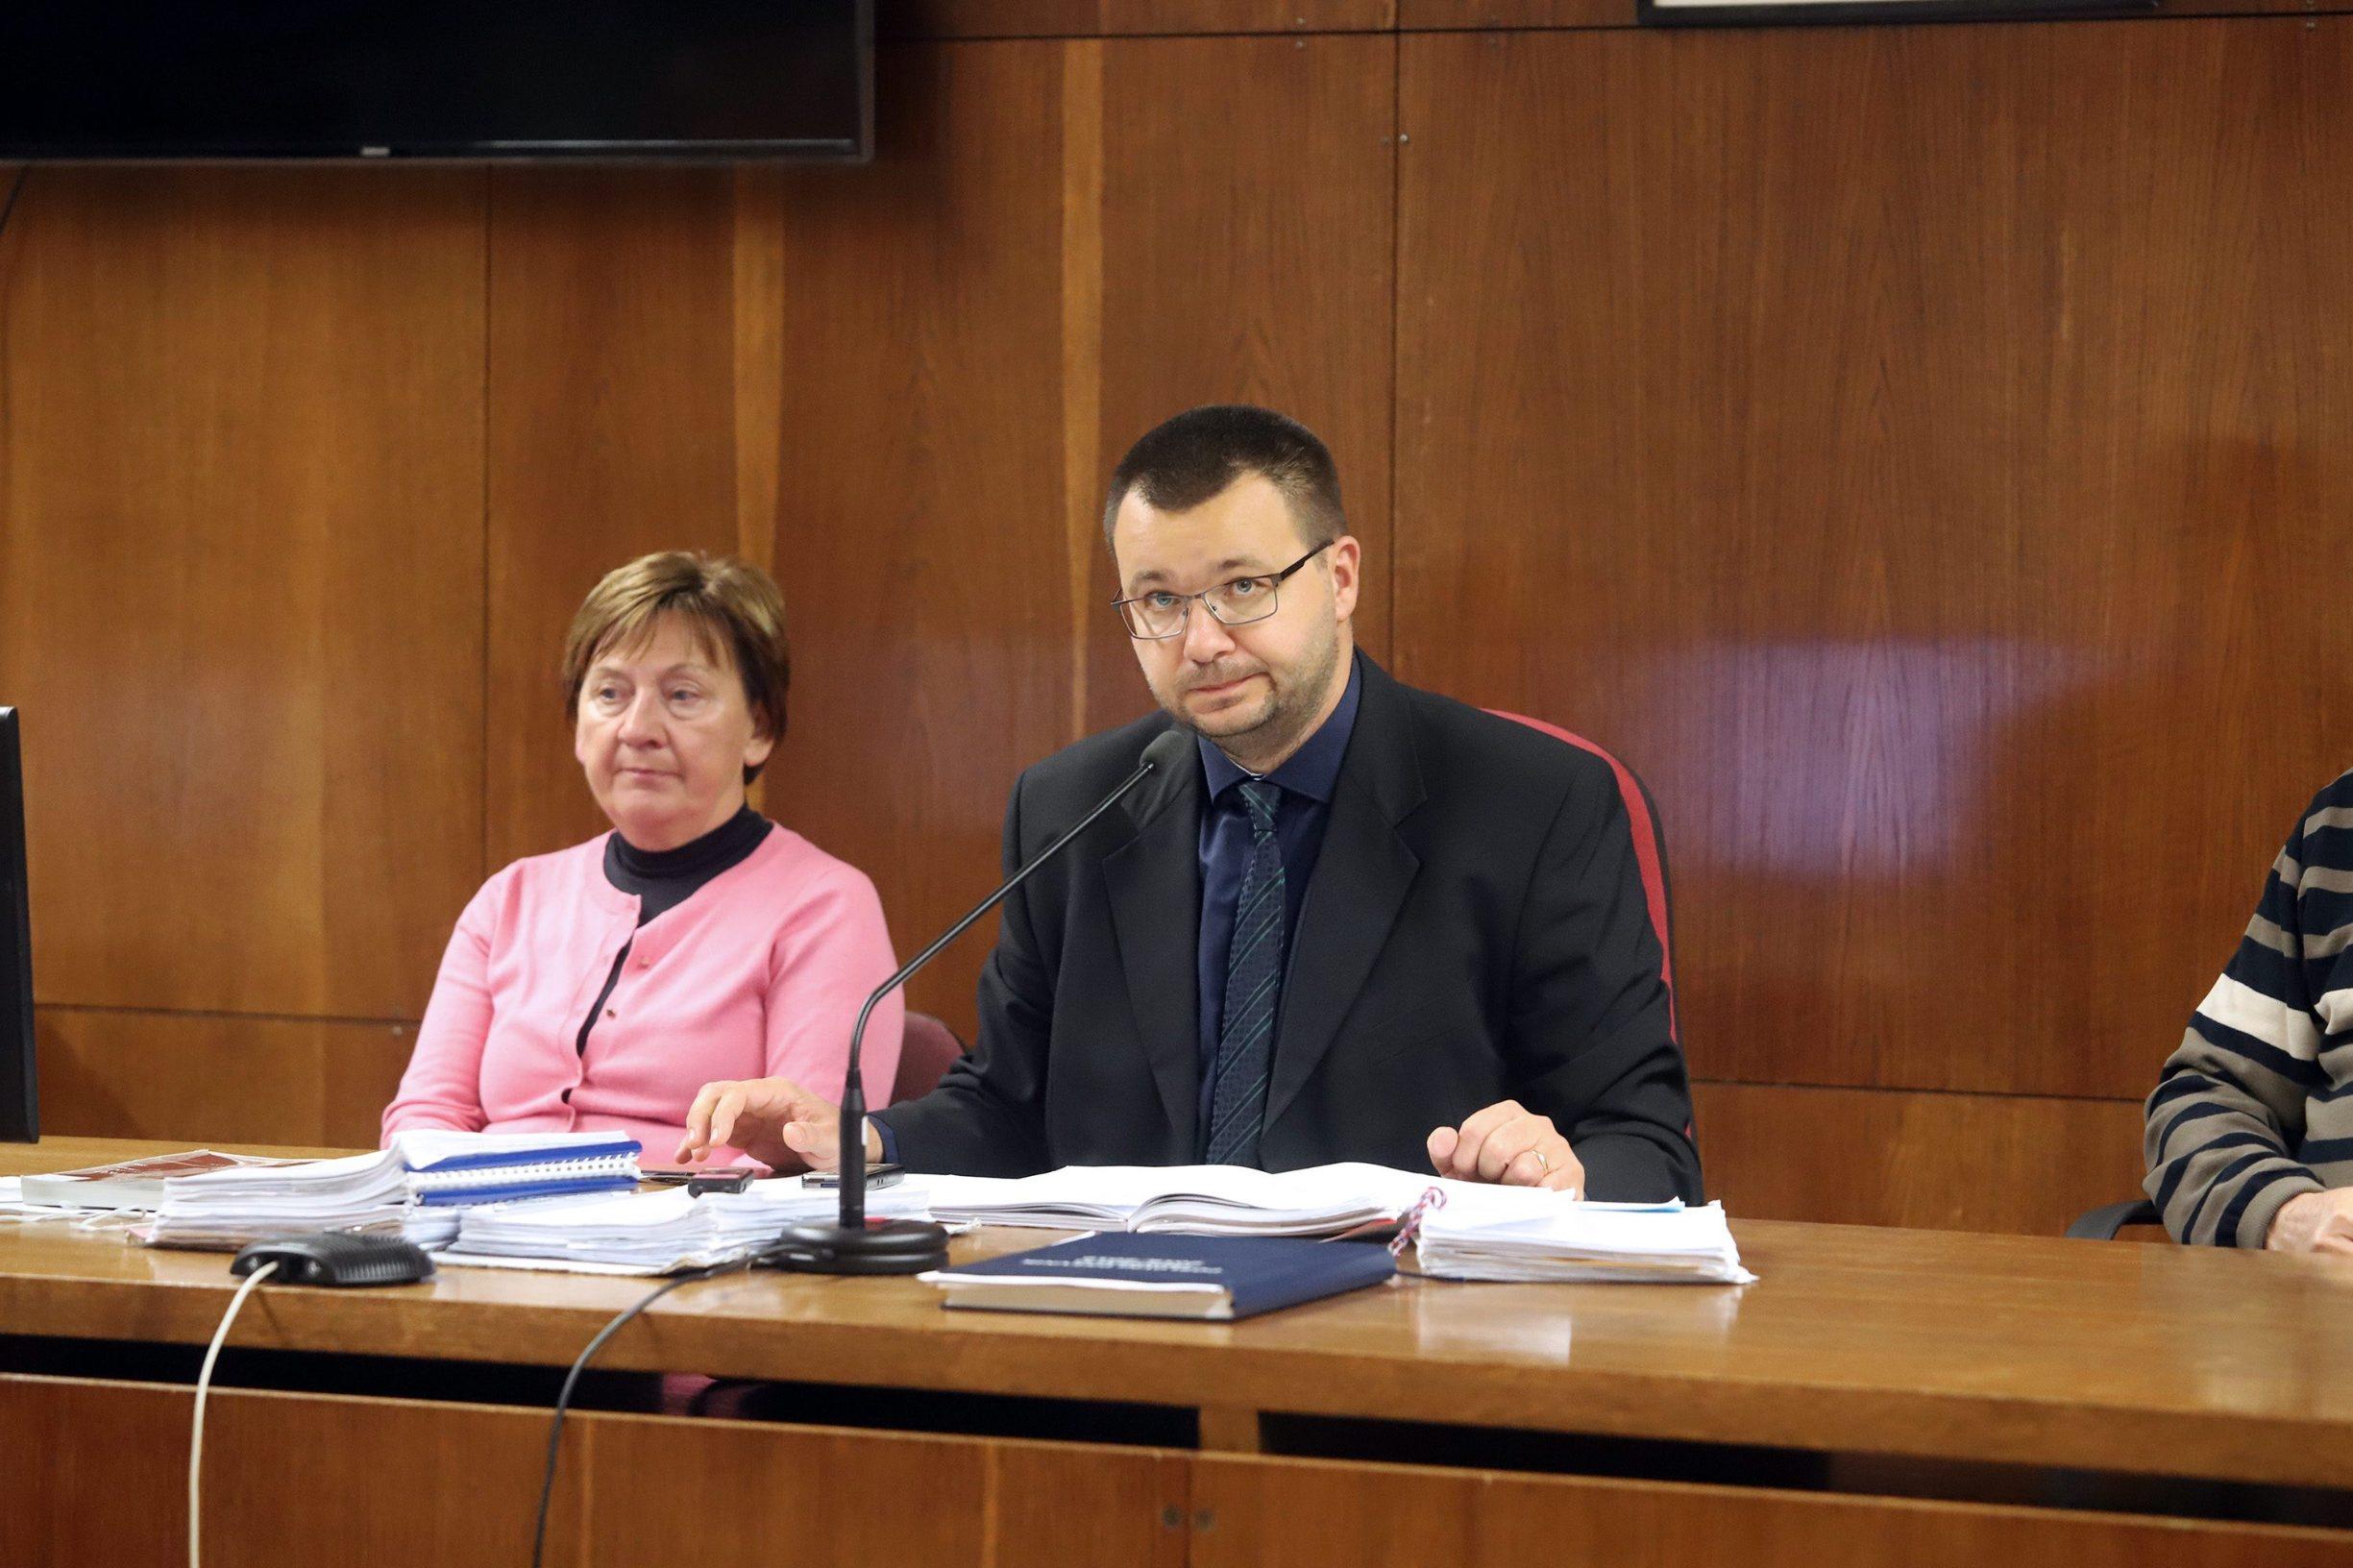 Varazdin, 071119. Na Zupanijskom sudu nastavljeno je sudjenje Smiljani Srnec za ubojstvo sestre Jasmine Dominic. Na fotografiji: sudac Tomislav Brdjanovic. Foto: Zeljko Hajdinjak / CROPIX